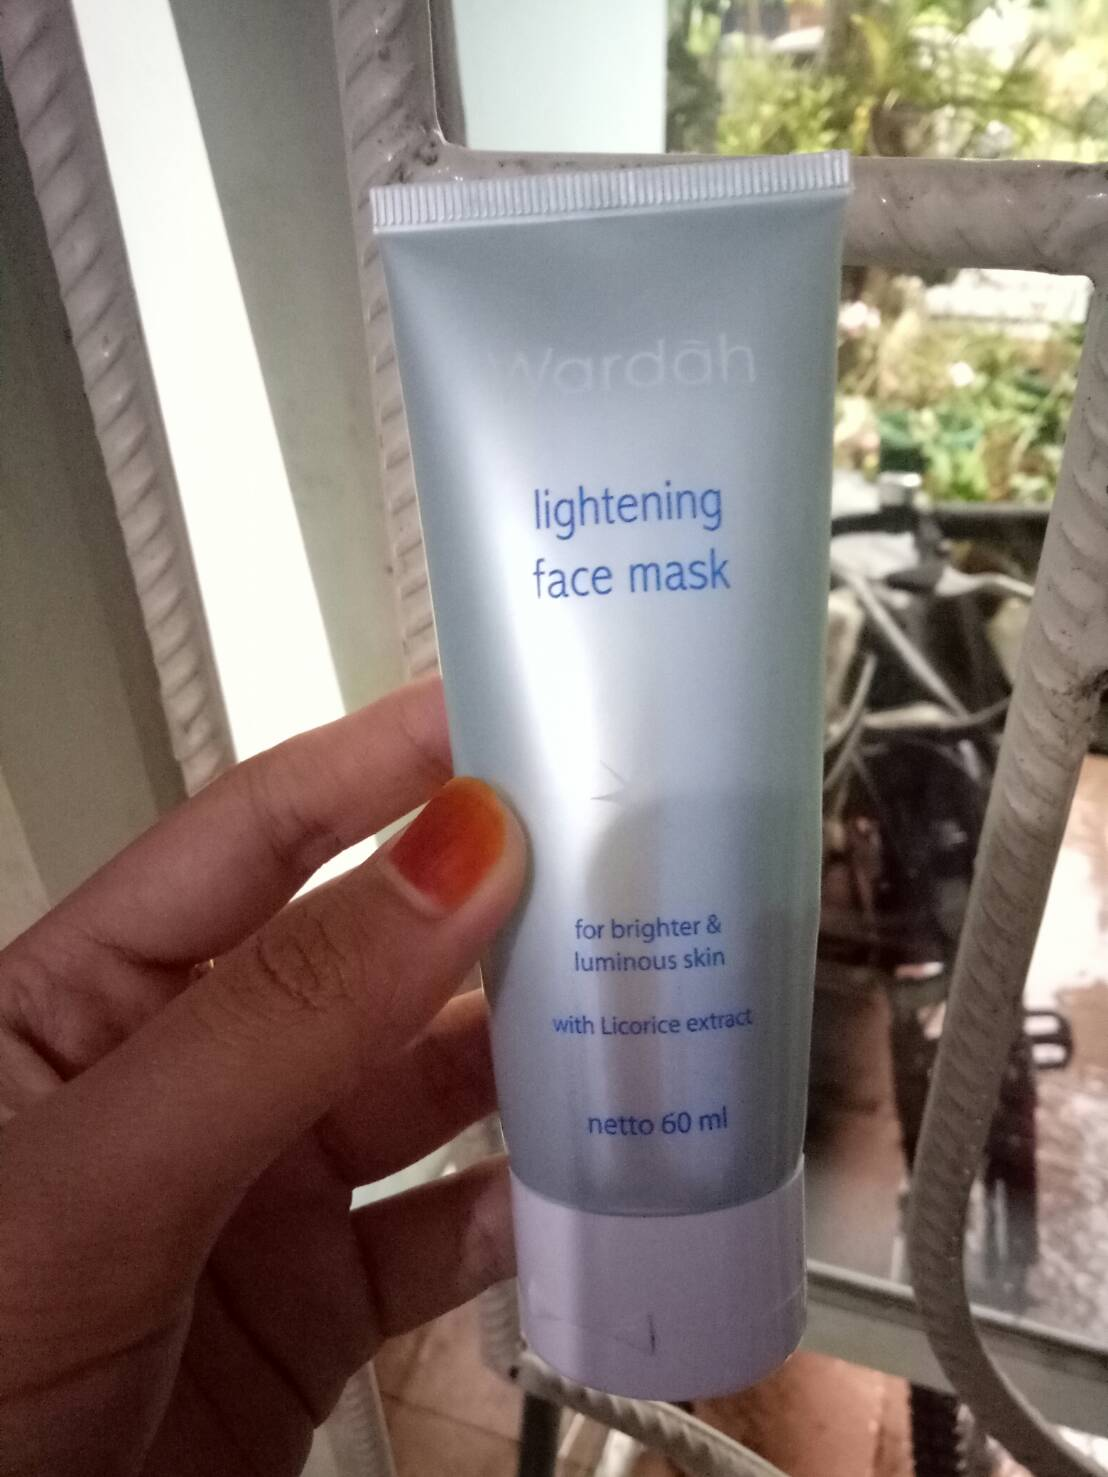 Review Wardah Lightening Face Mask 60 Ml Beauty Journal By Sociolla Ayunda Rahma